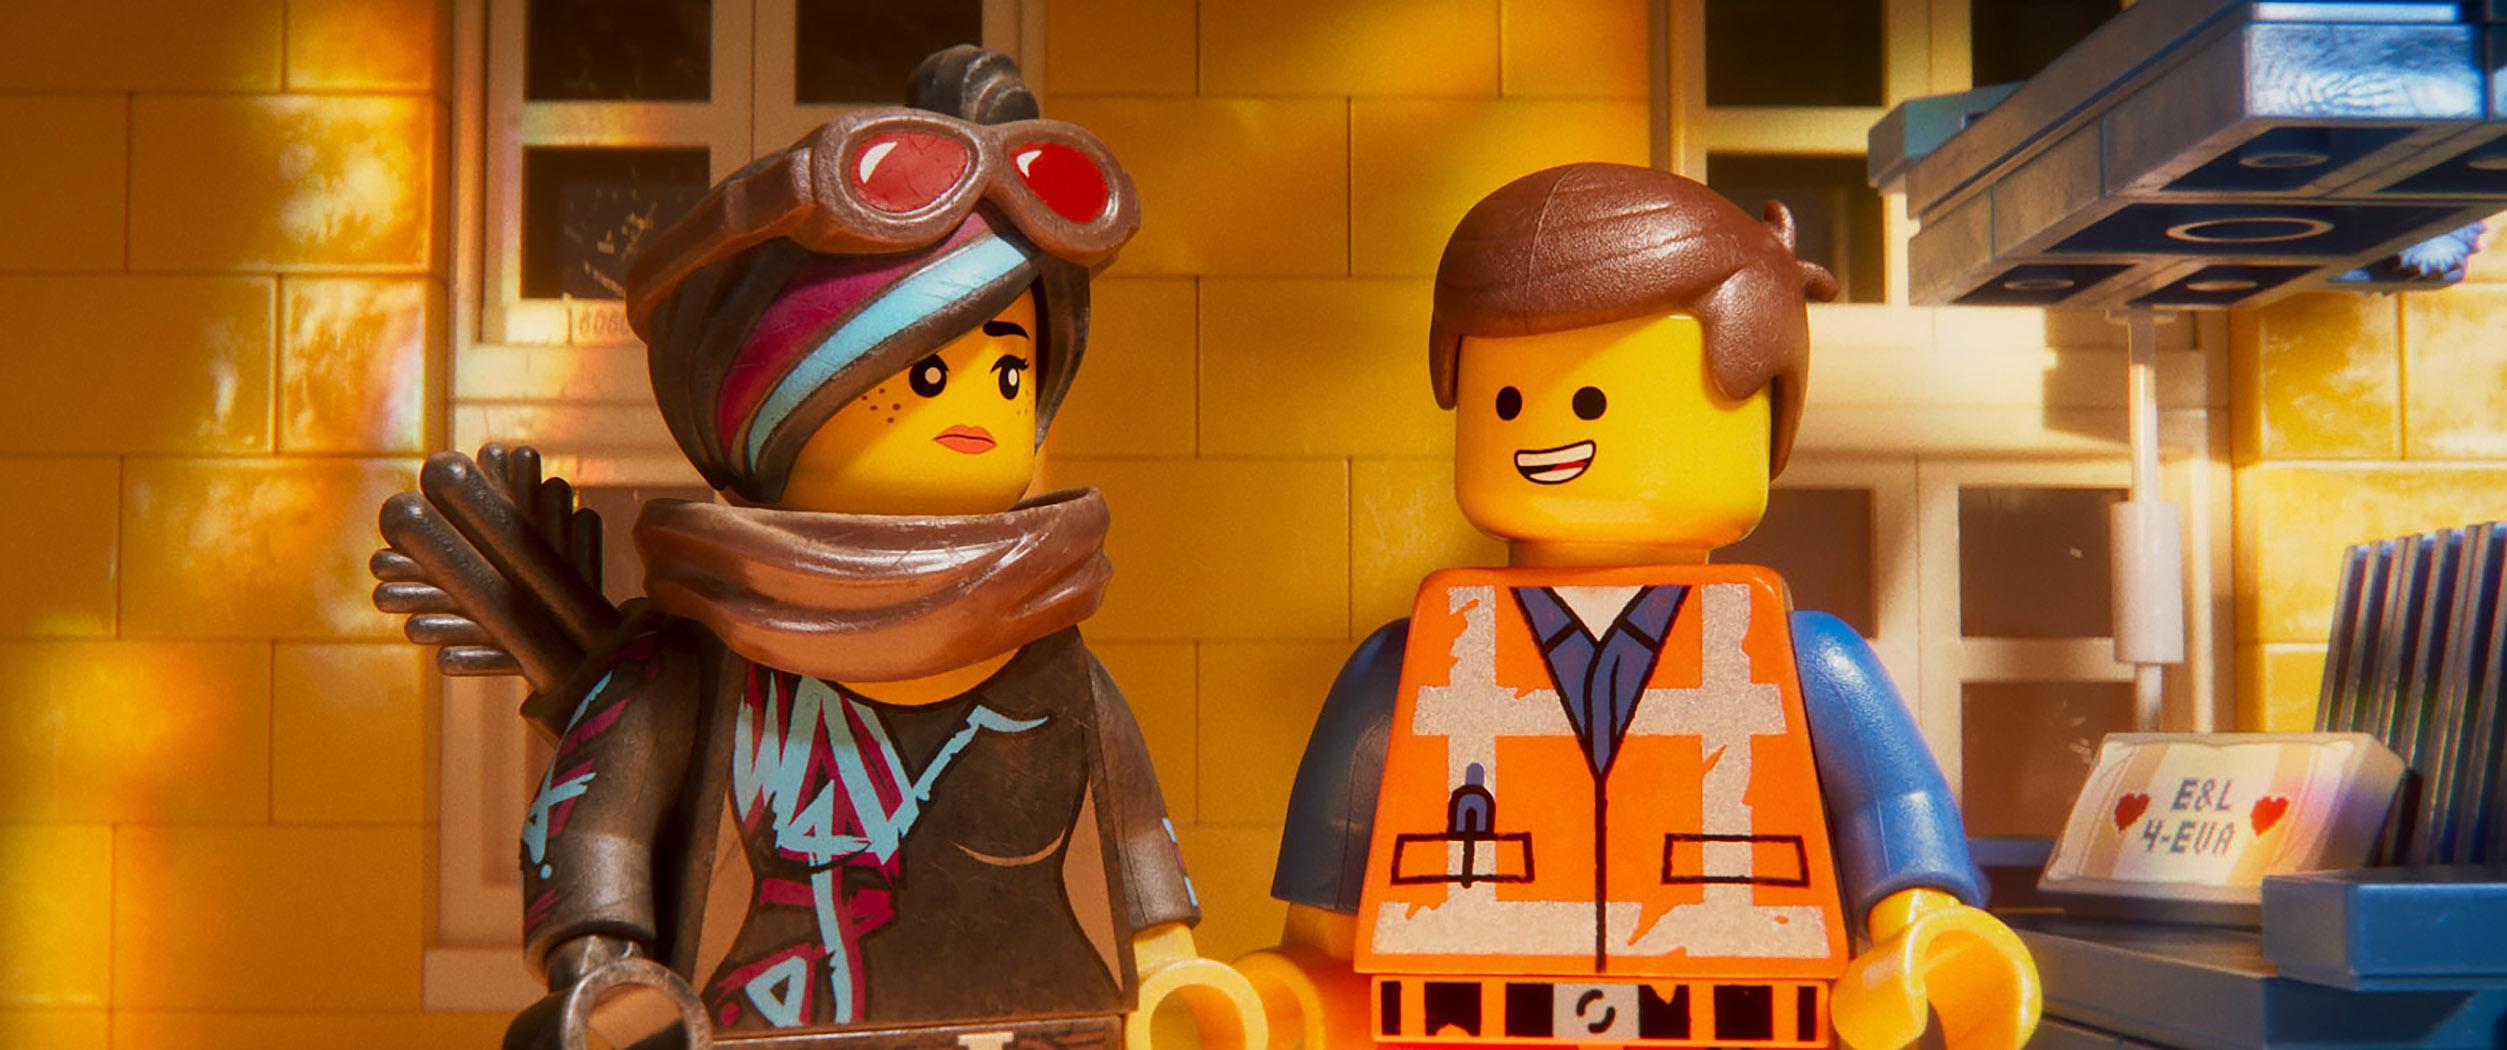 WATCH: LEGO Movie 2 Gets A Trailer